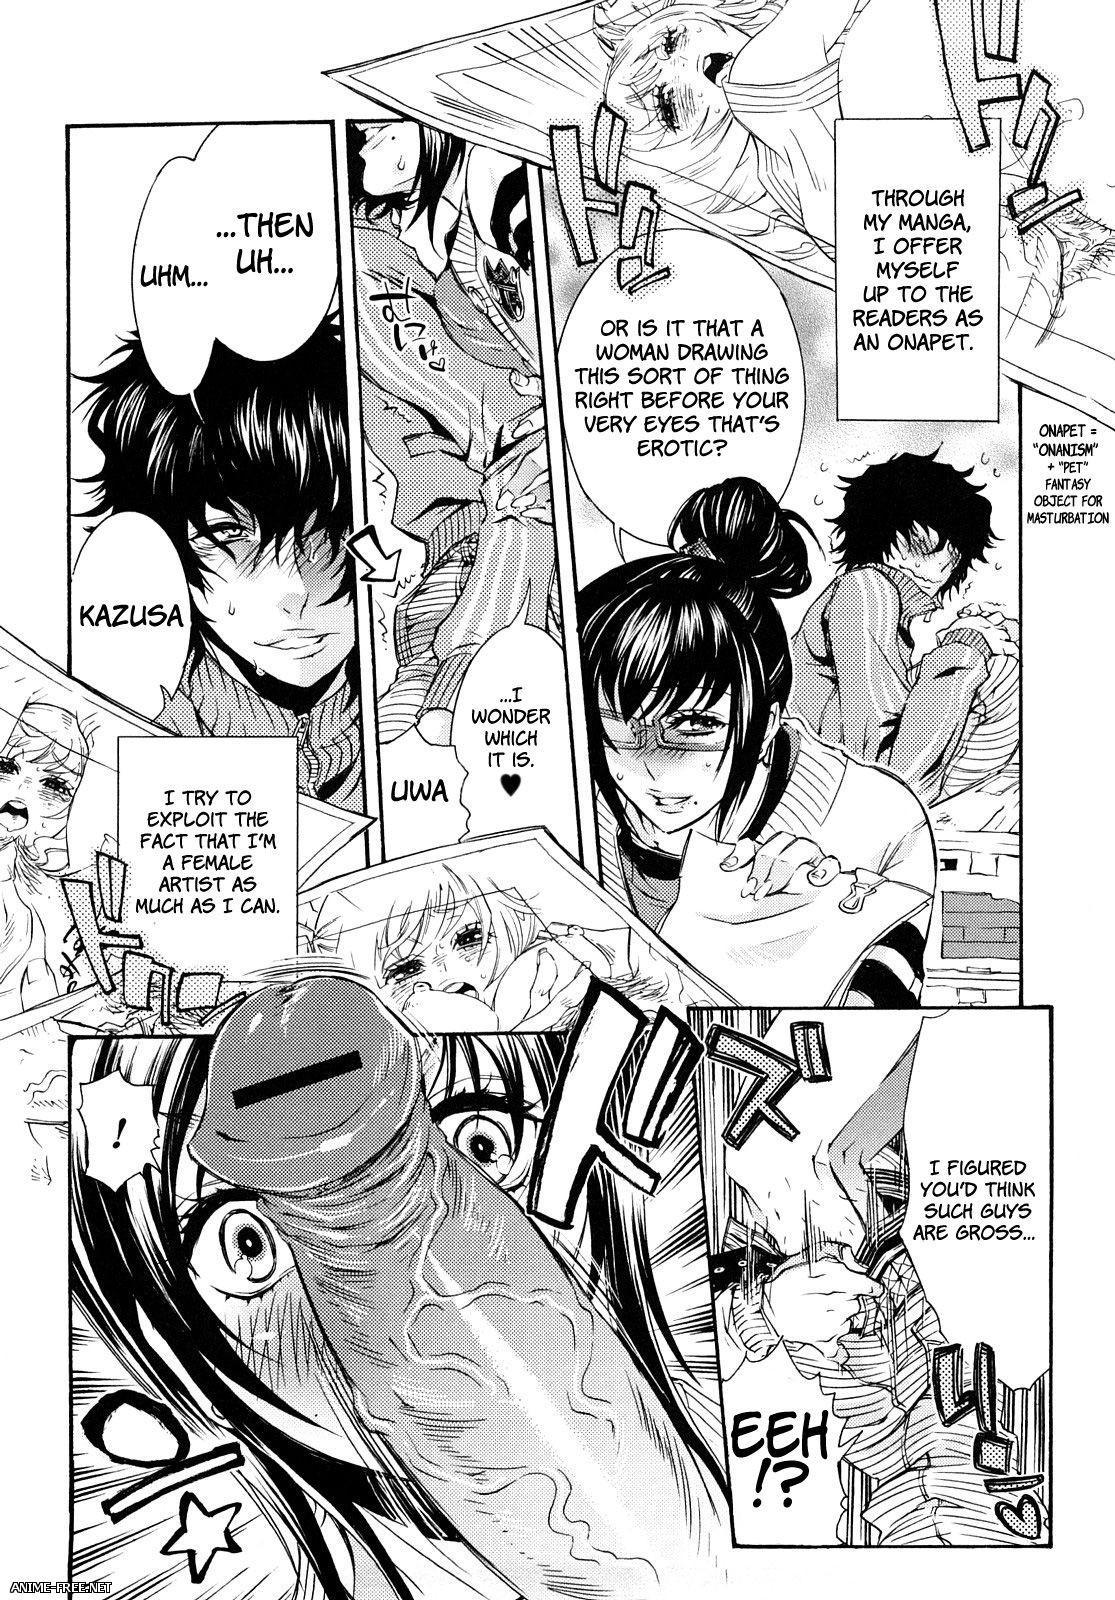 Hattori Mitsuka / Sadistic Mary - Сборник хентай манги [Ptcen] [JAP,ENG] Manga Hentai